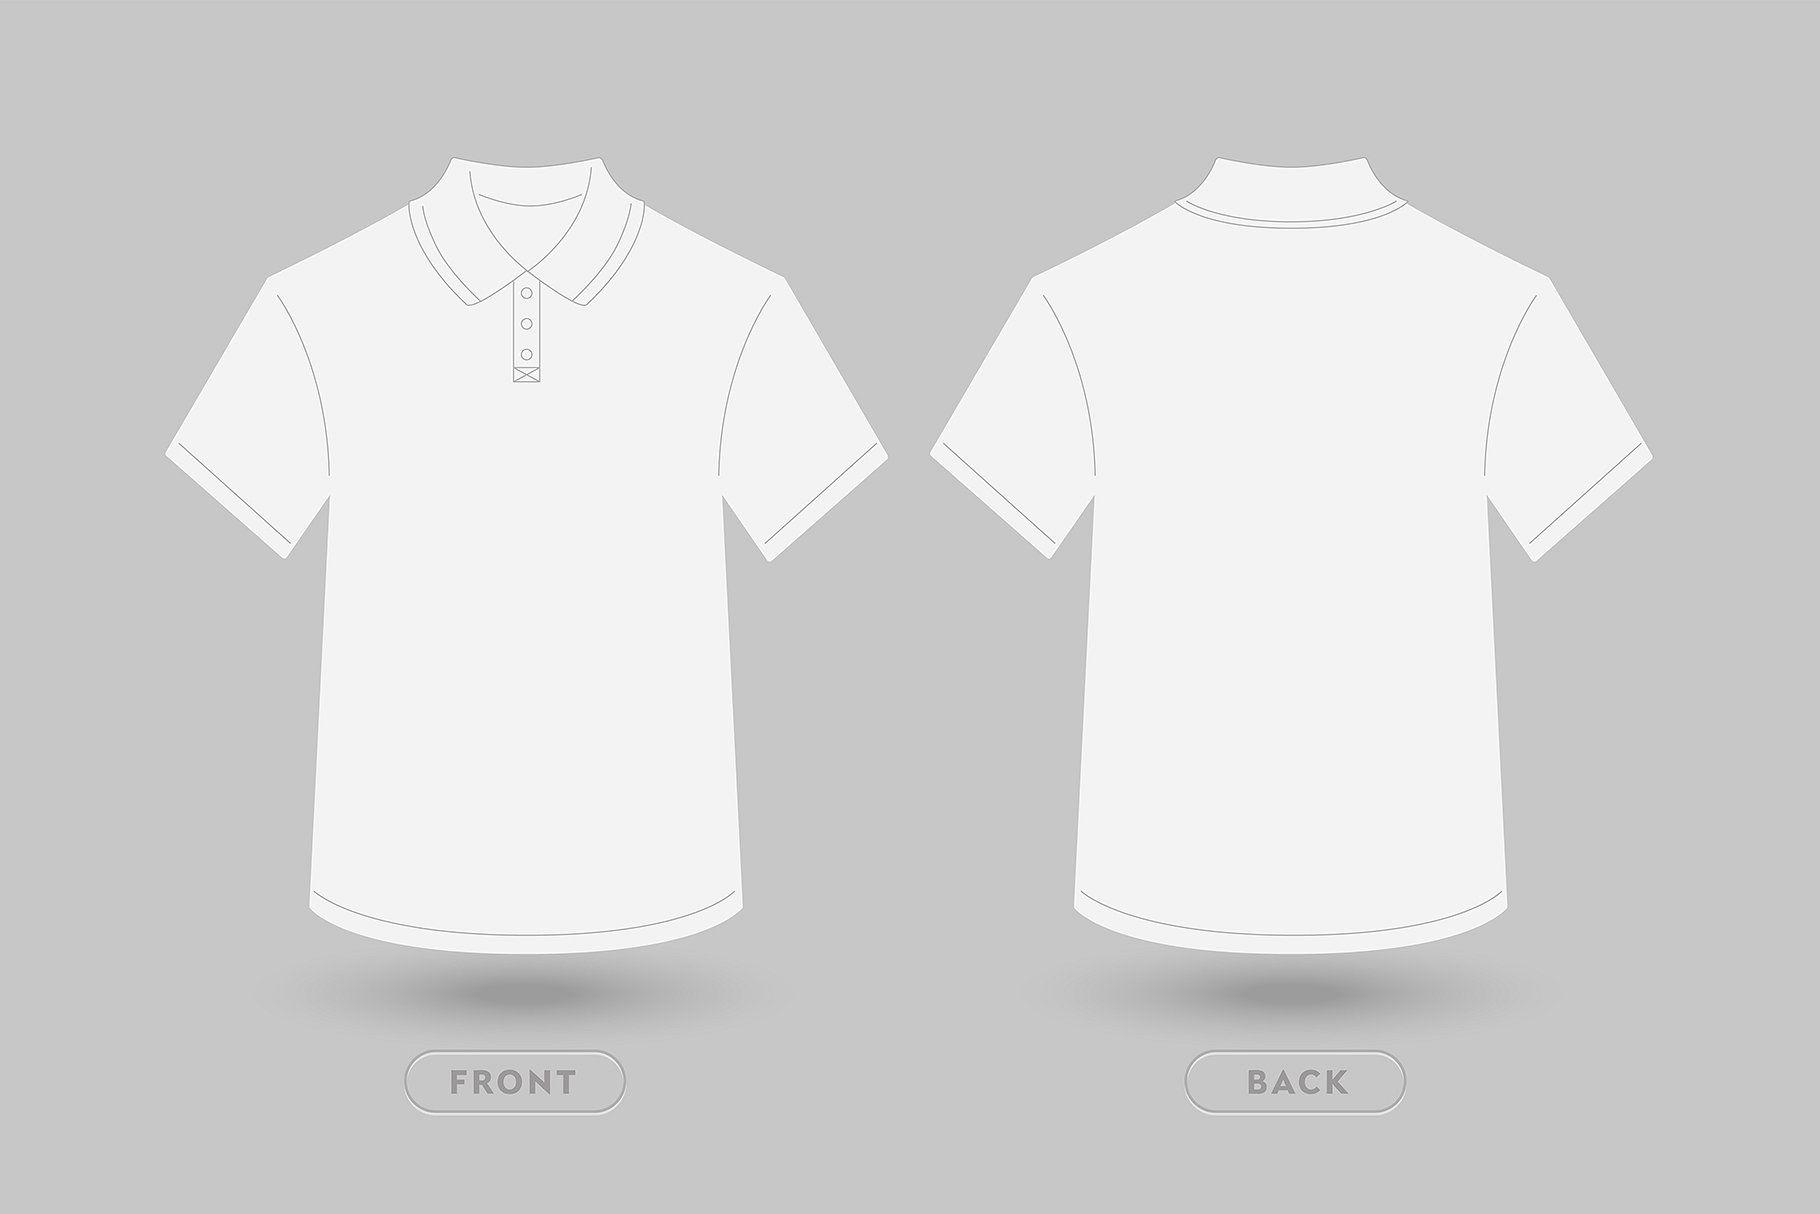 Download Polo T Shirt Vector Mockup Polo Shirt Design T Shirt Design Template Shirts